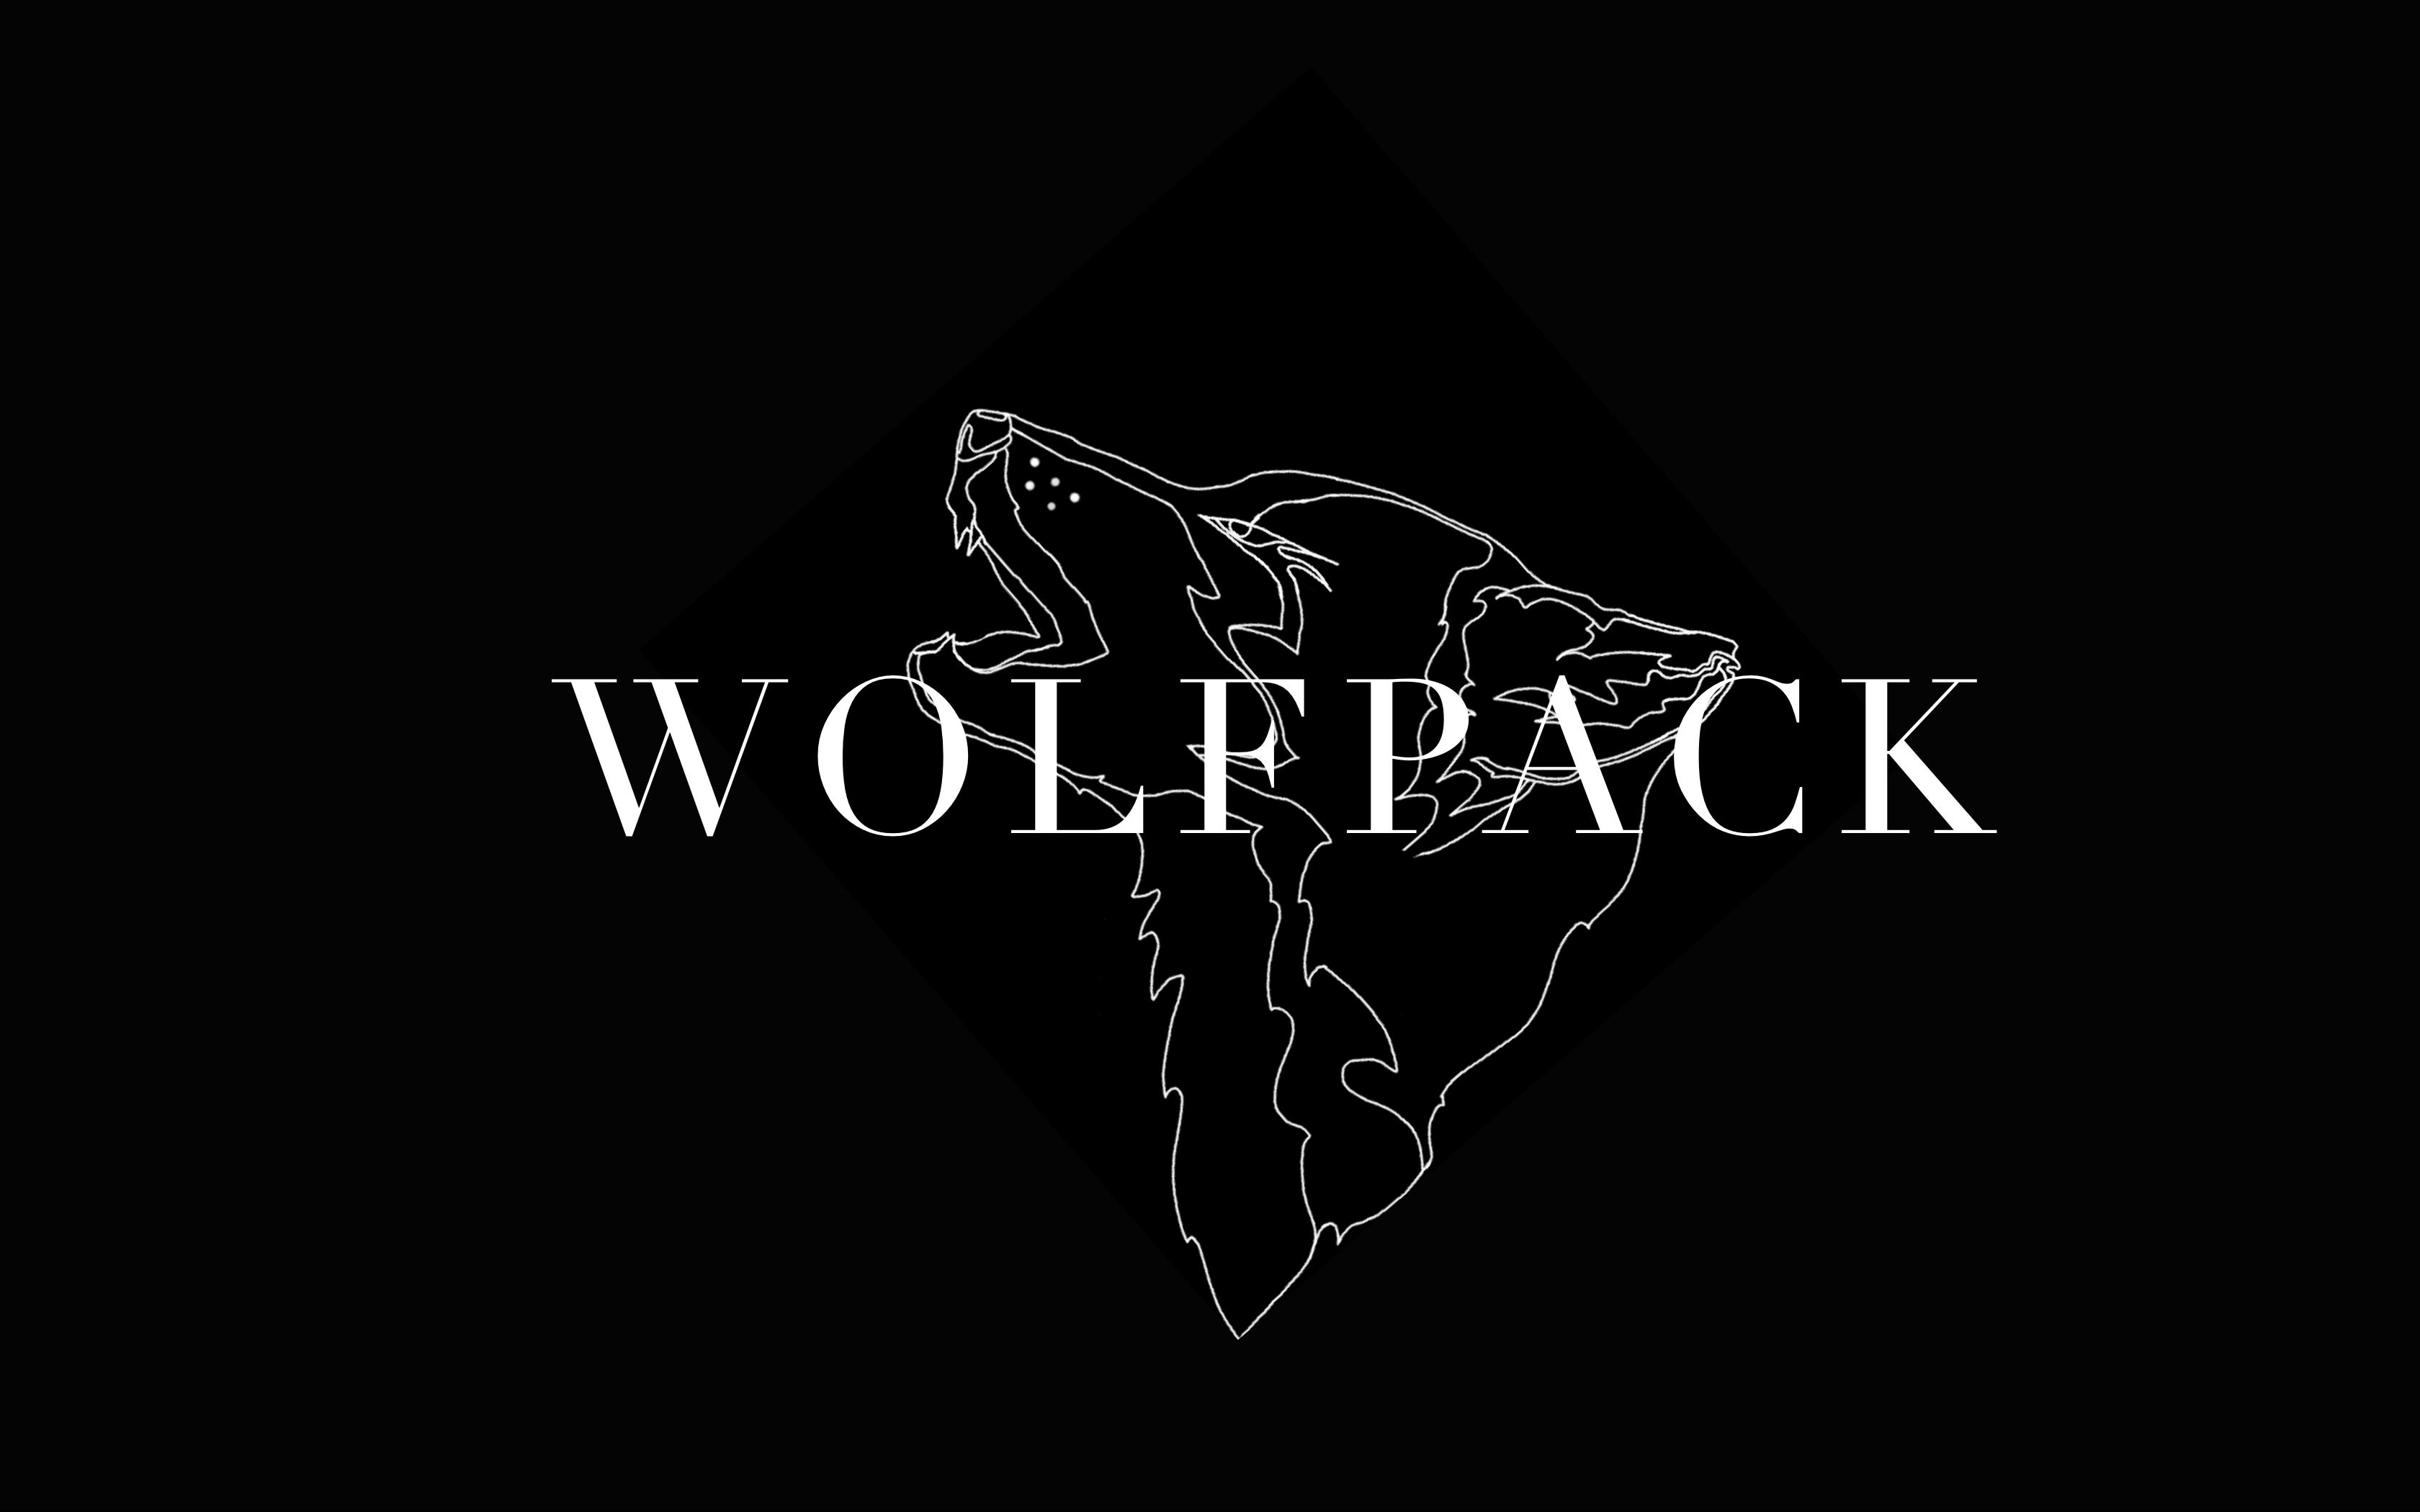 WOLFPACK UPDATE 1